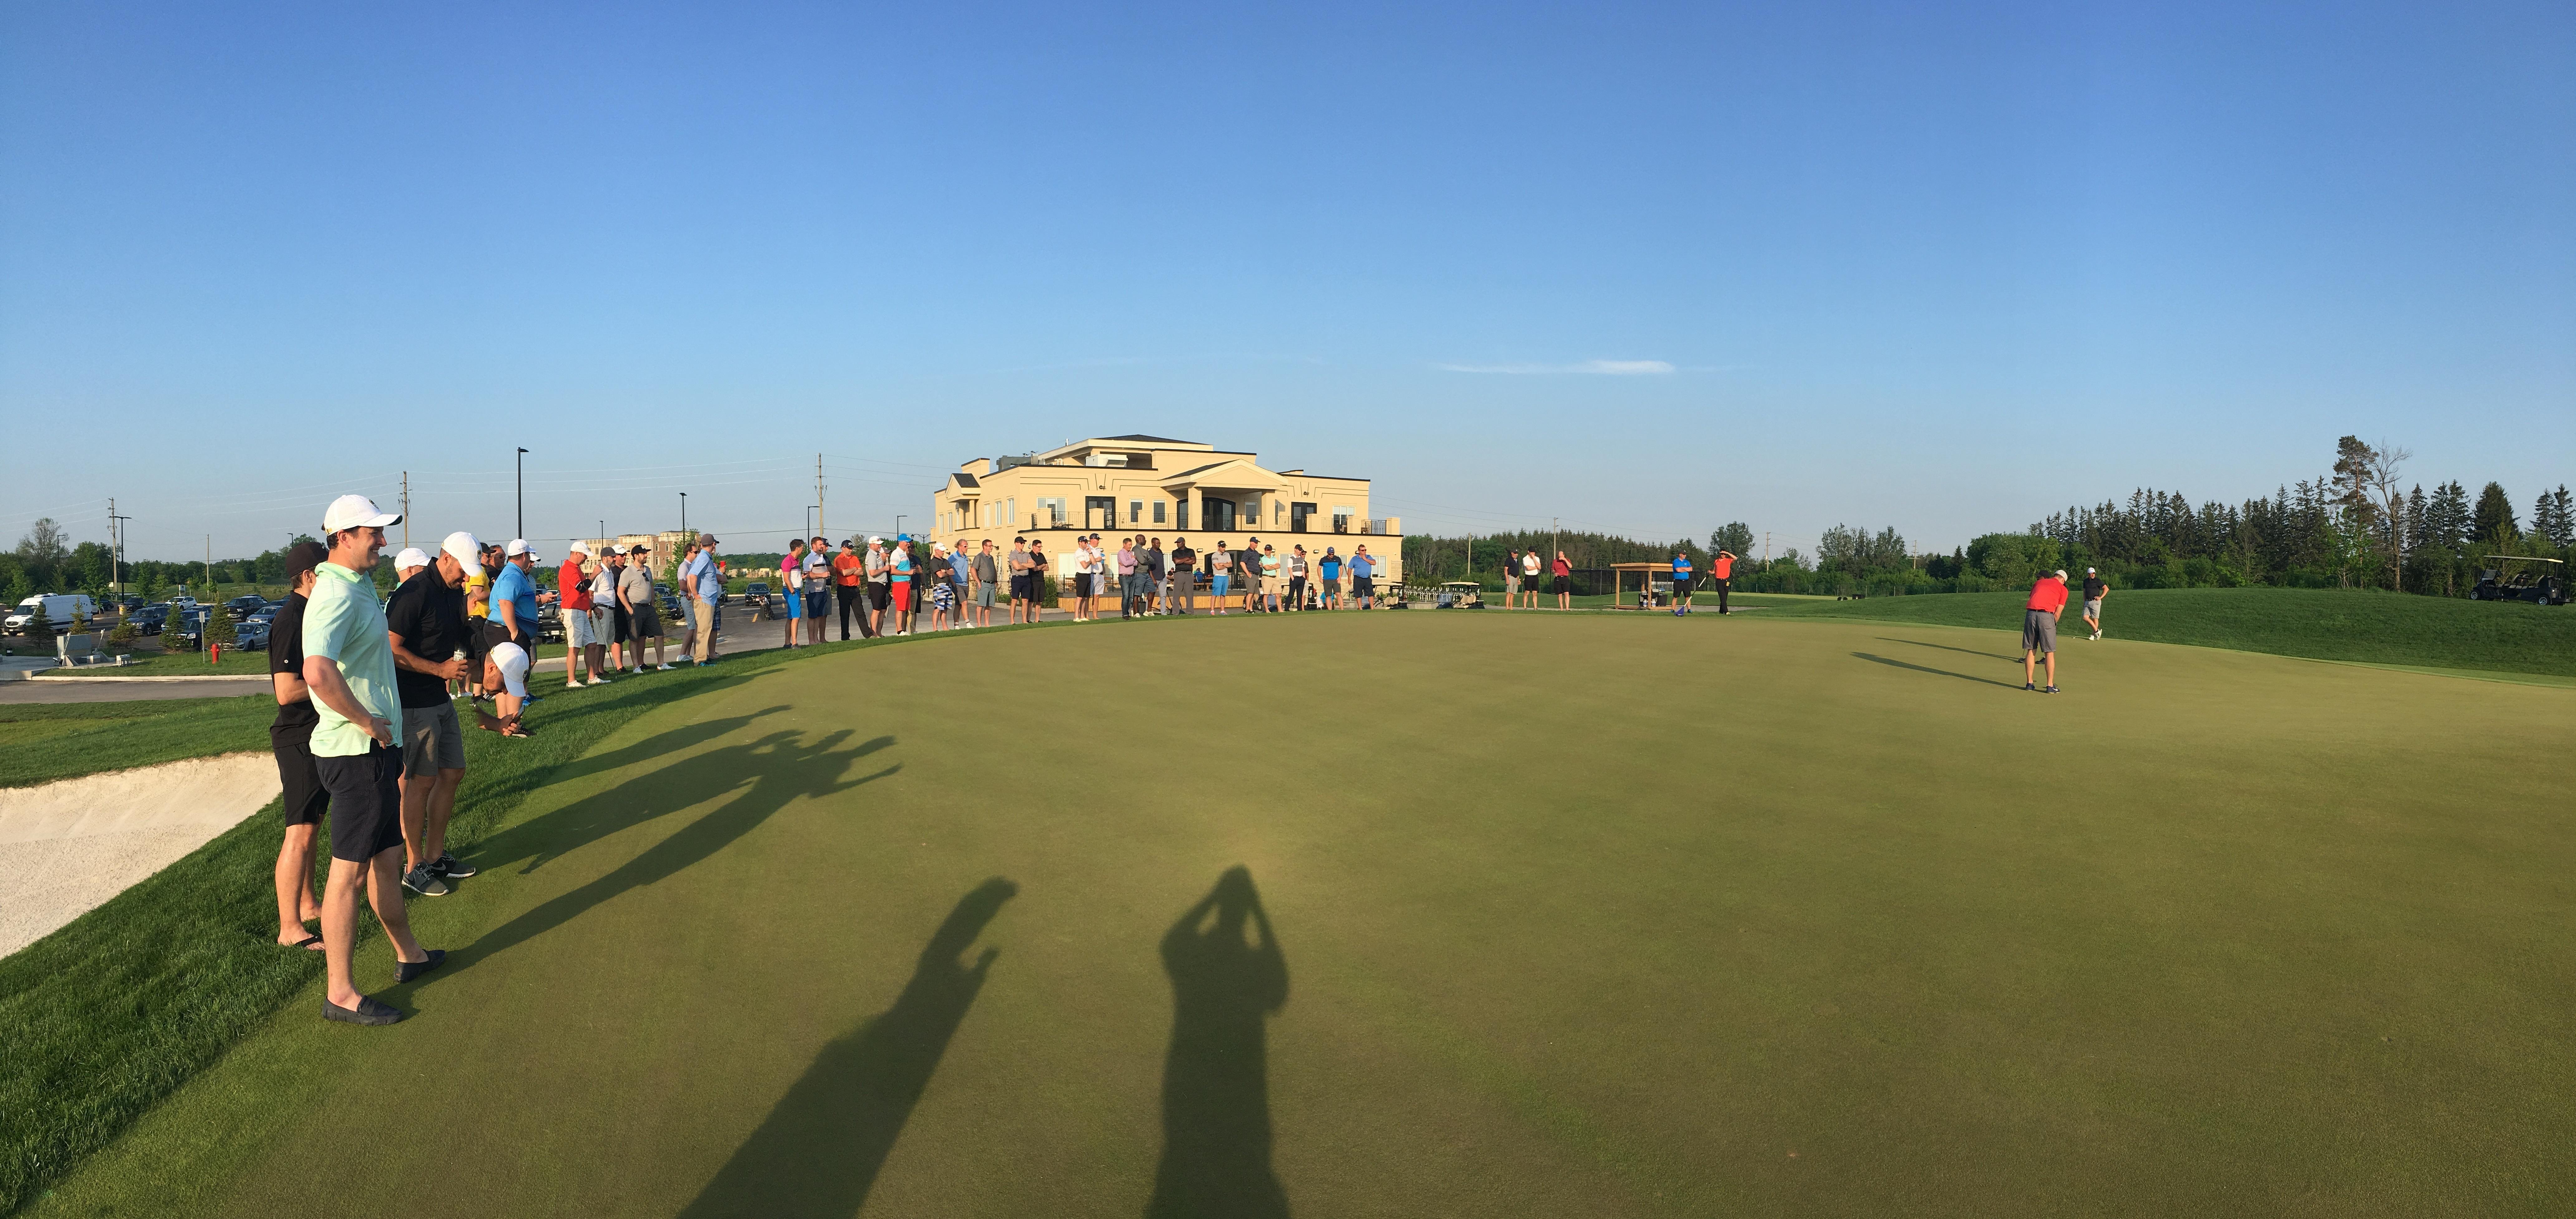 CJGA (Canadian Junior Golf Association) Charity Golf Tournament on Sept 17 gallery image #9